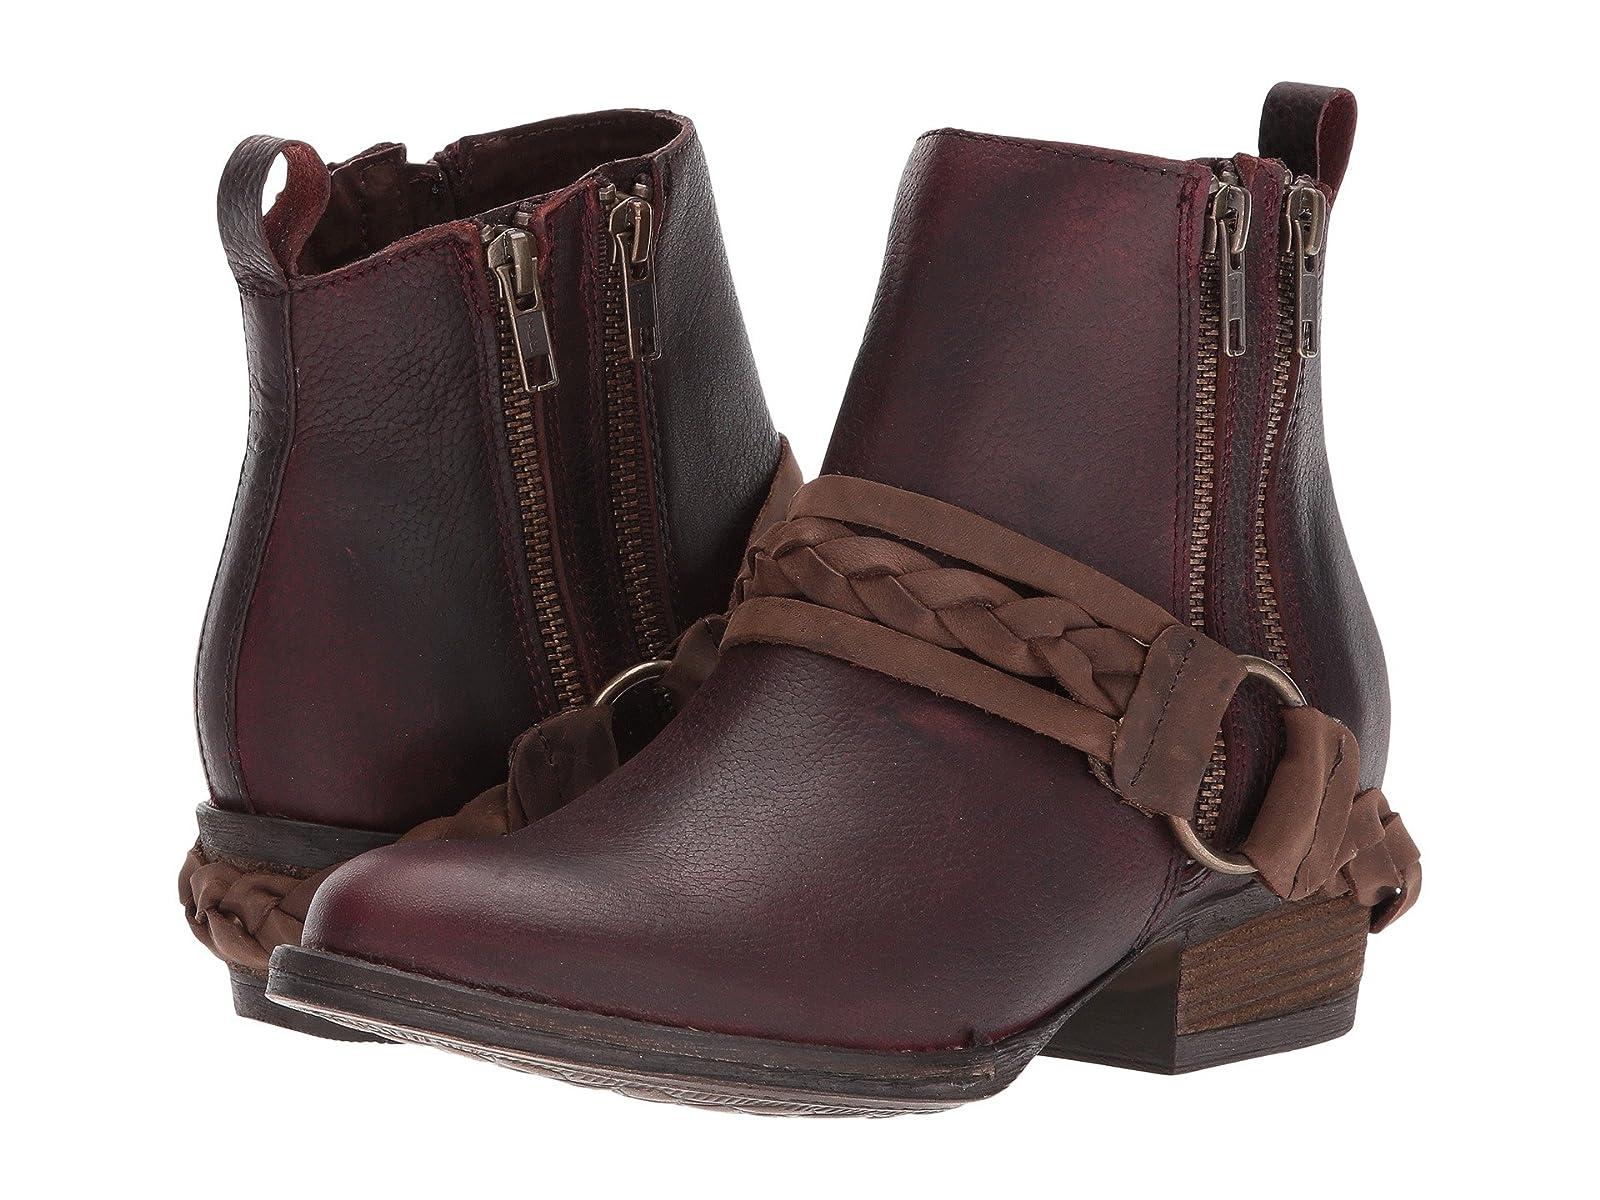 VOLATILE YokelCheap and distinctive eye-catching shoes